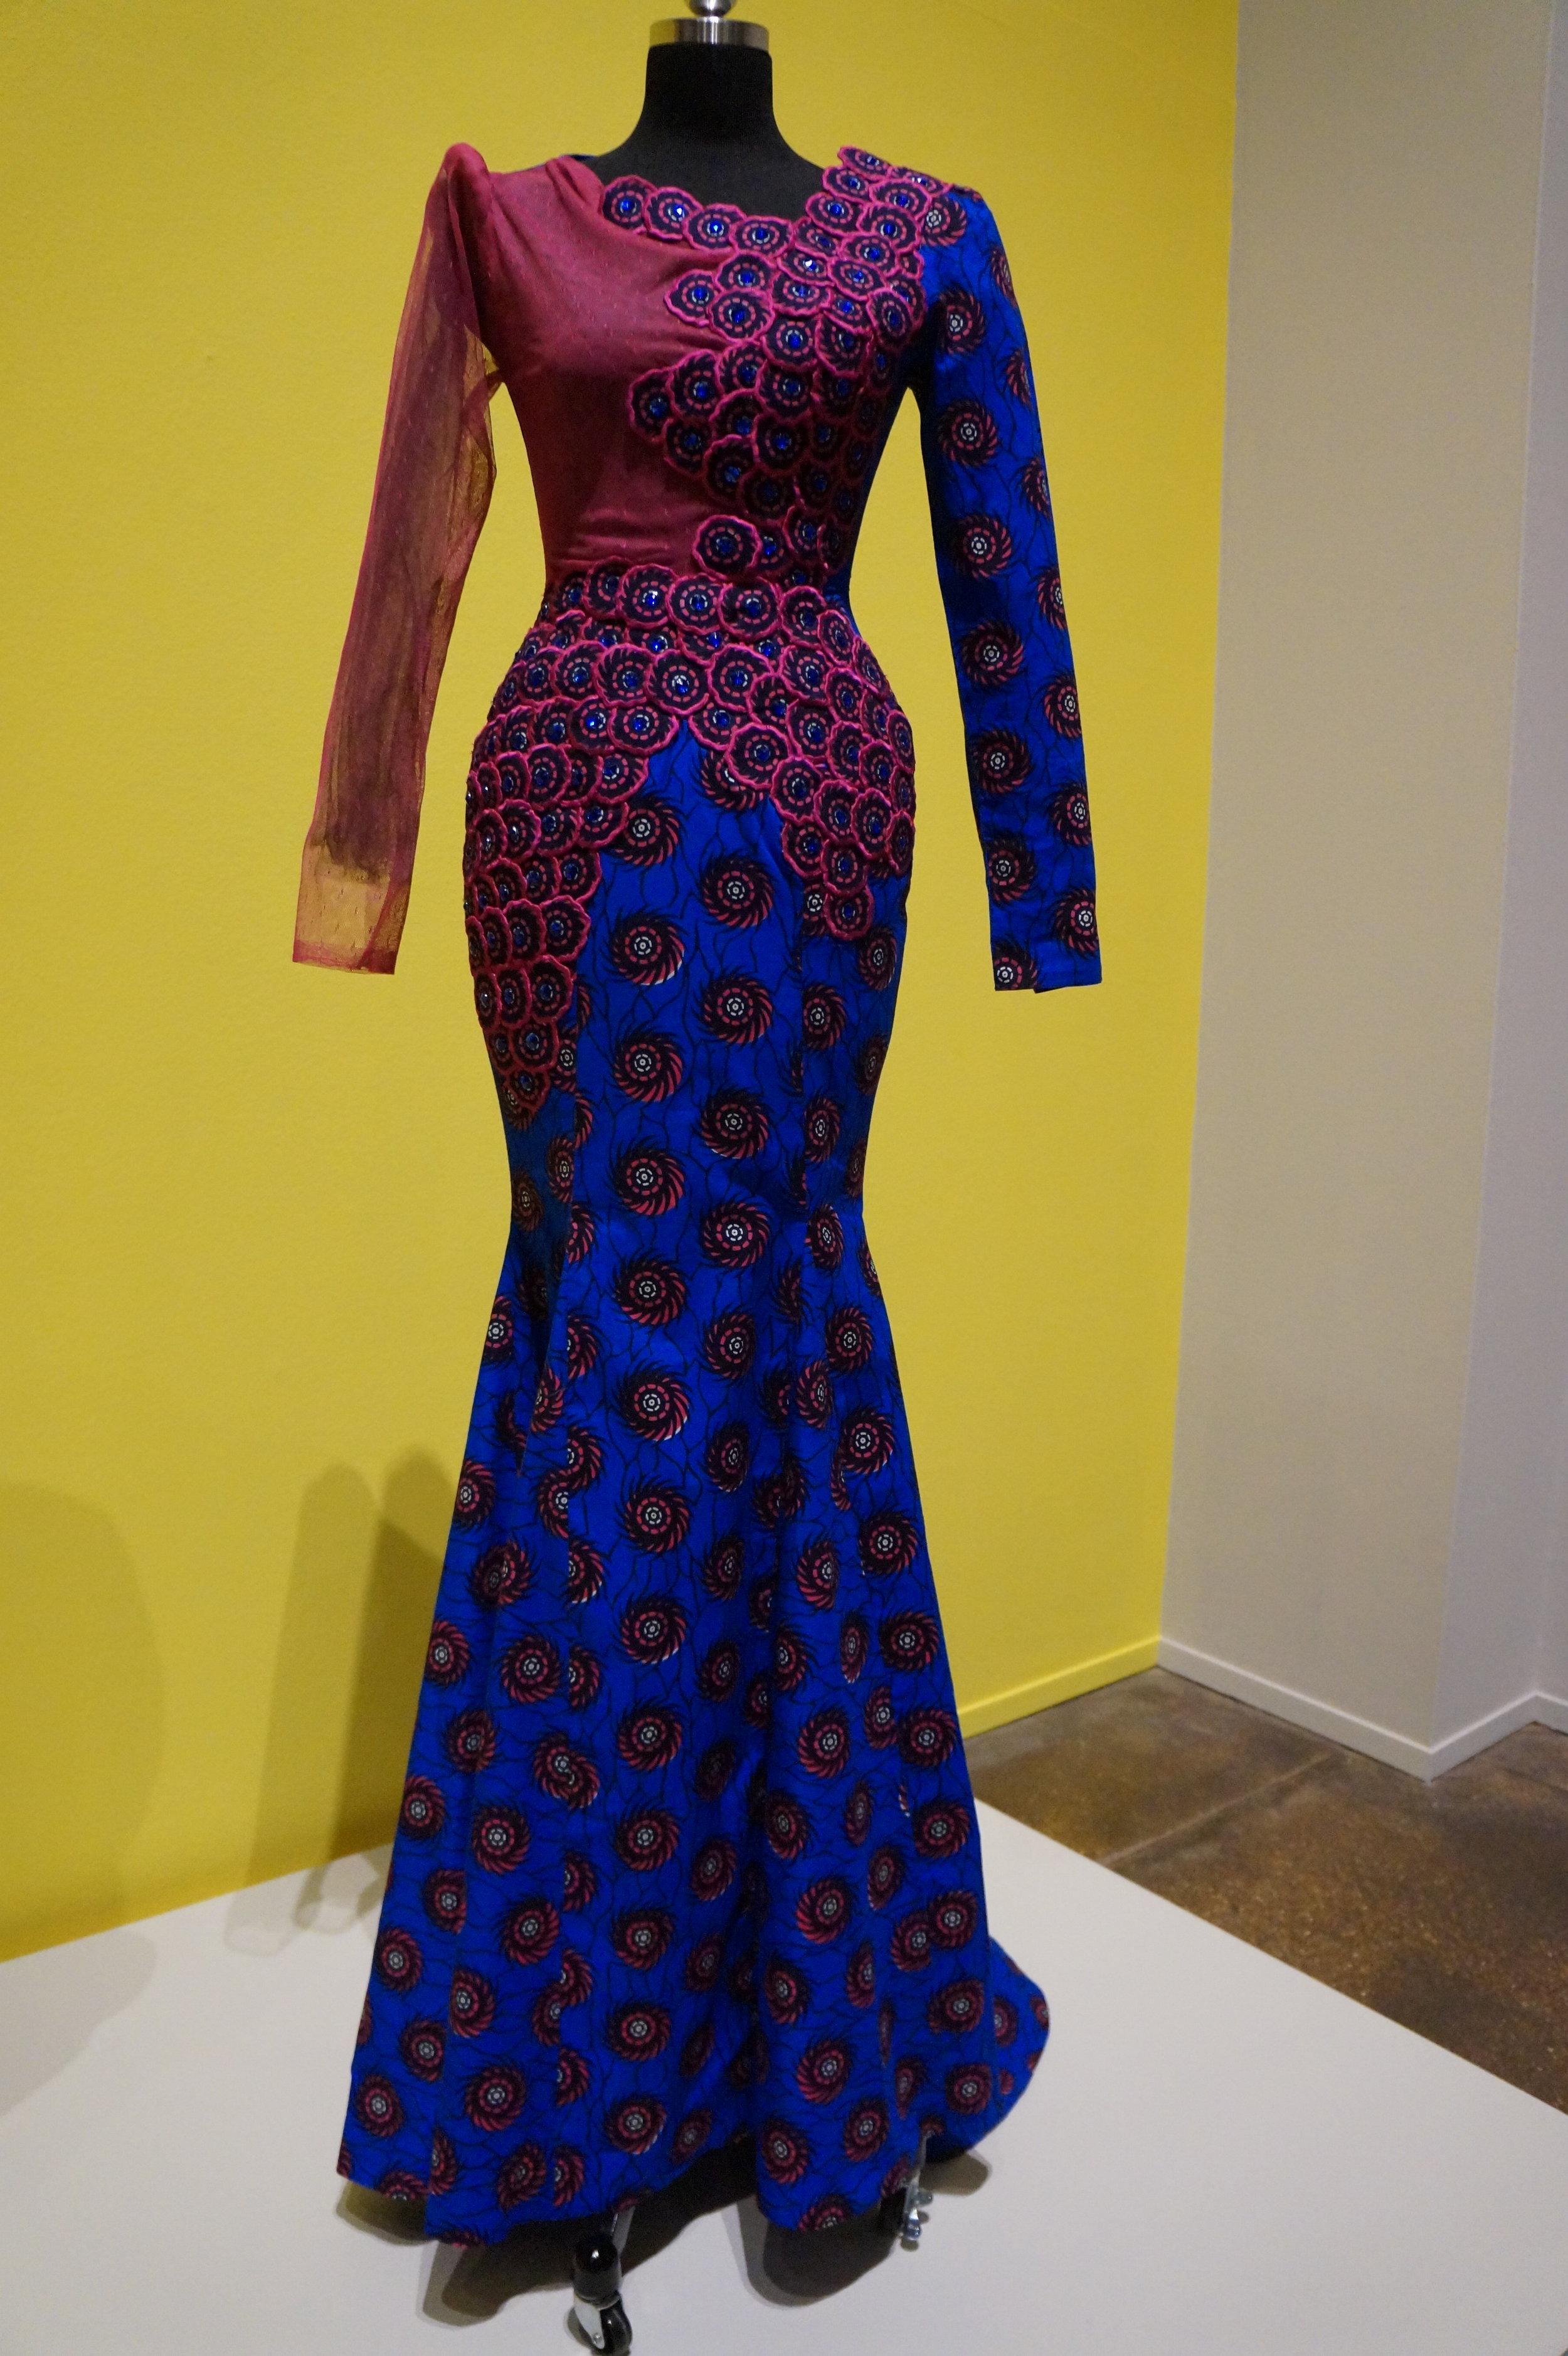 Andrea Fenise Memphis Fashion Blogger shares African Print Fashion Now Exhibit